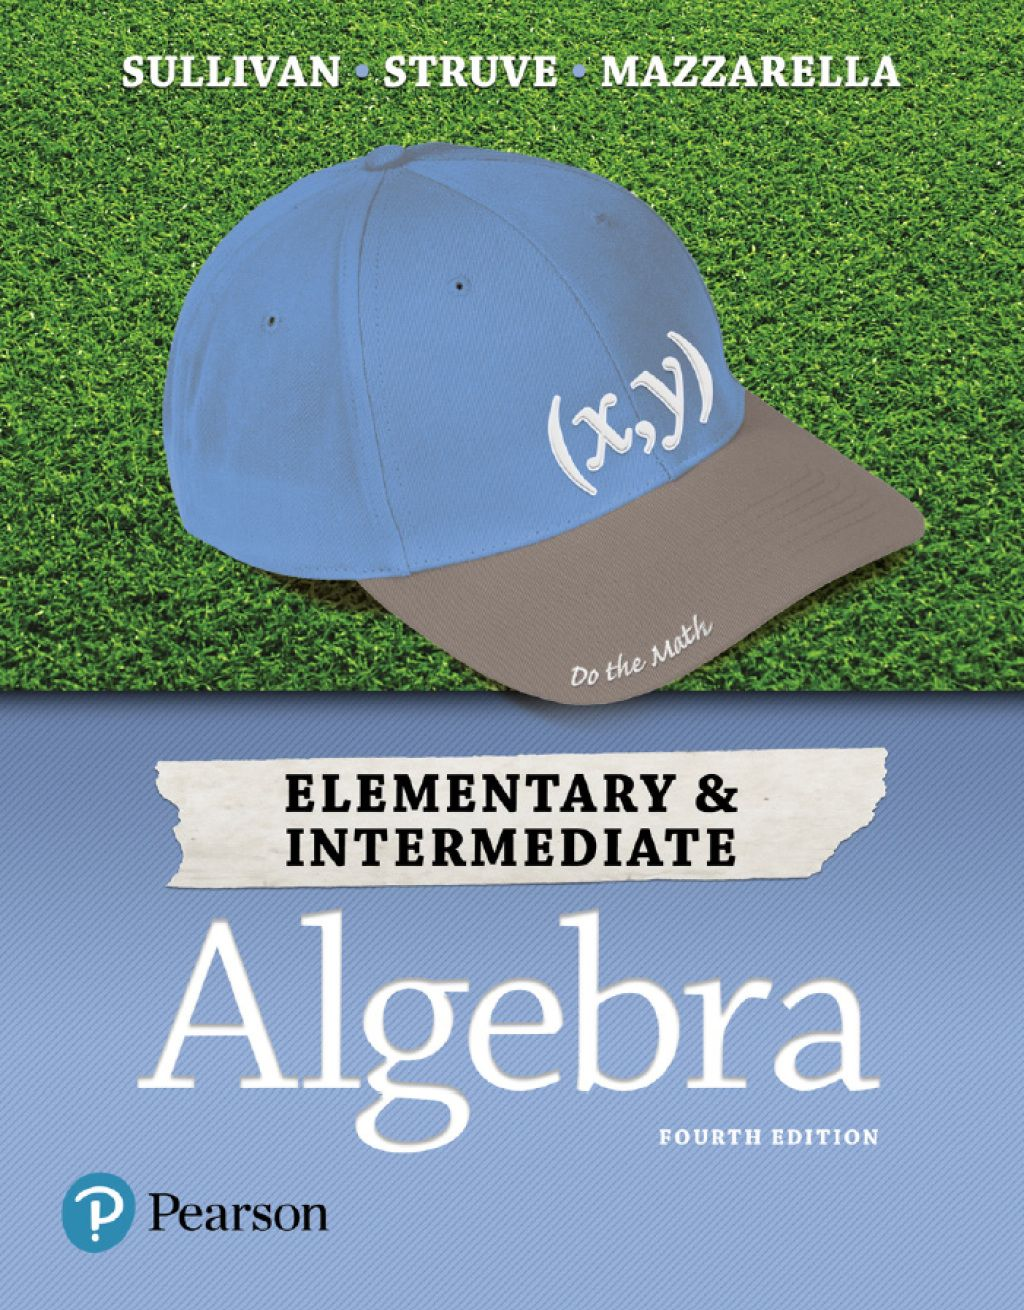 Elementary Amp Intermediate Algebra Ebook Rental